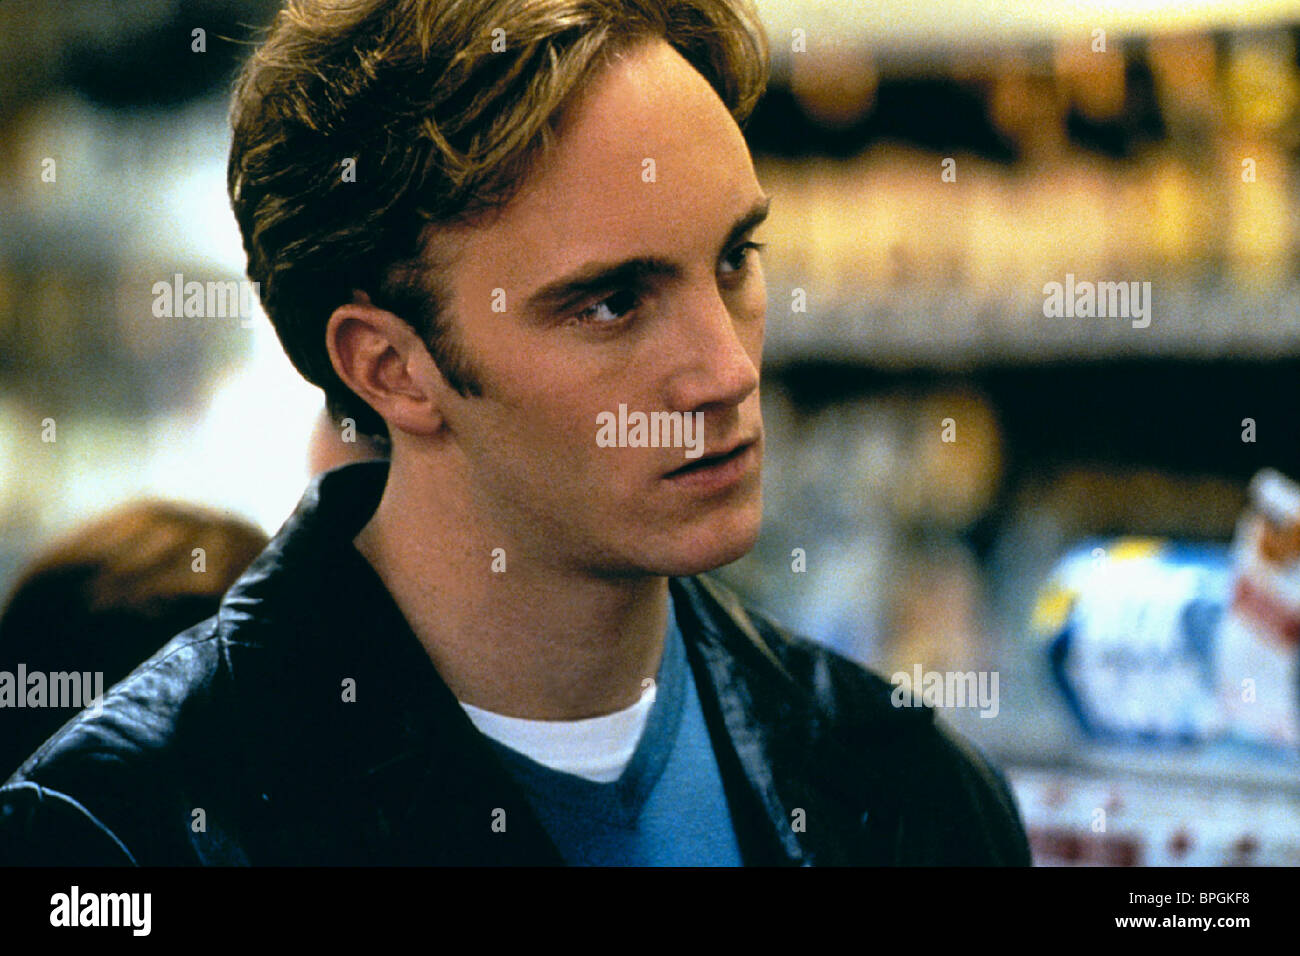 JAY MOHR GO (1999) - Stock Image